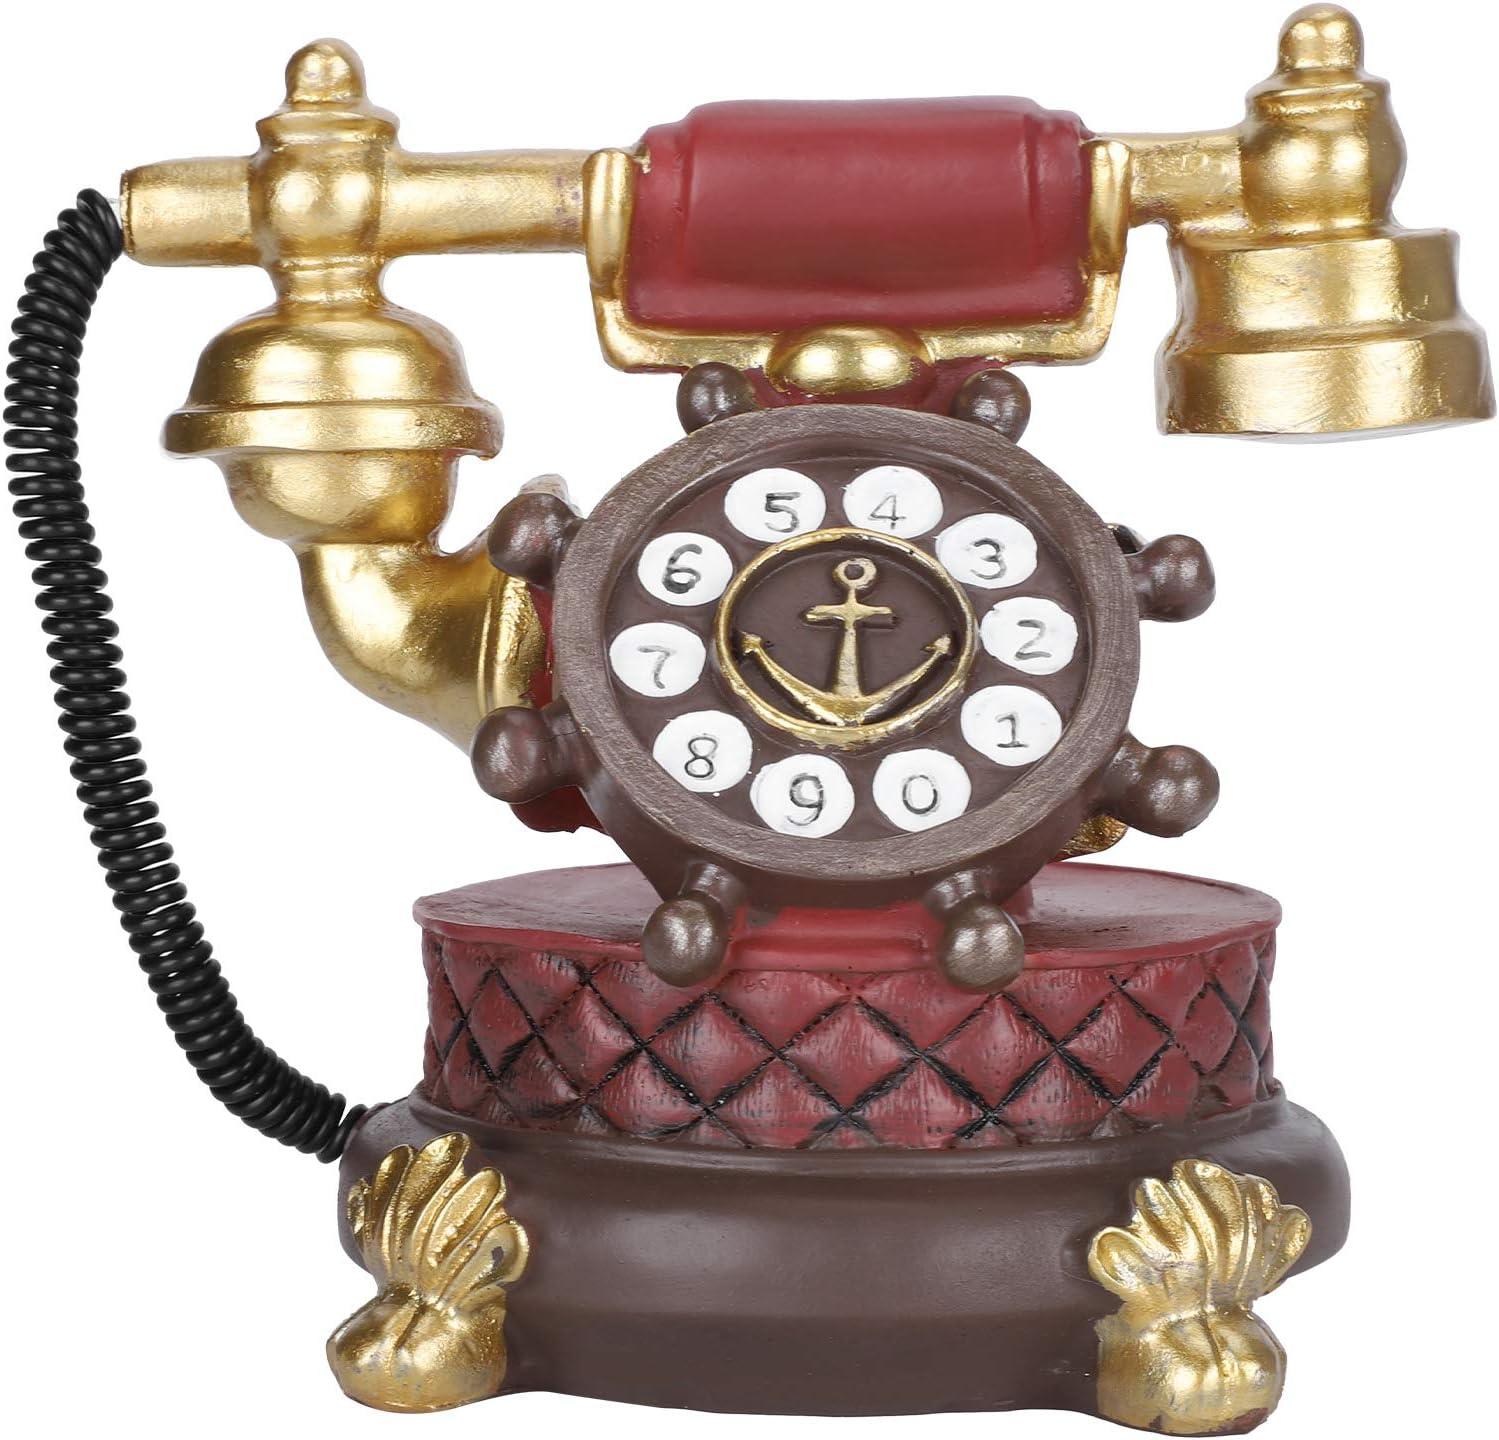 Vintage Dial Telephone Model Piggy Bank for Home Cafe Bar Decoration Gift Antique Telephone Ornament Blue